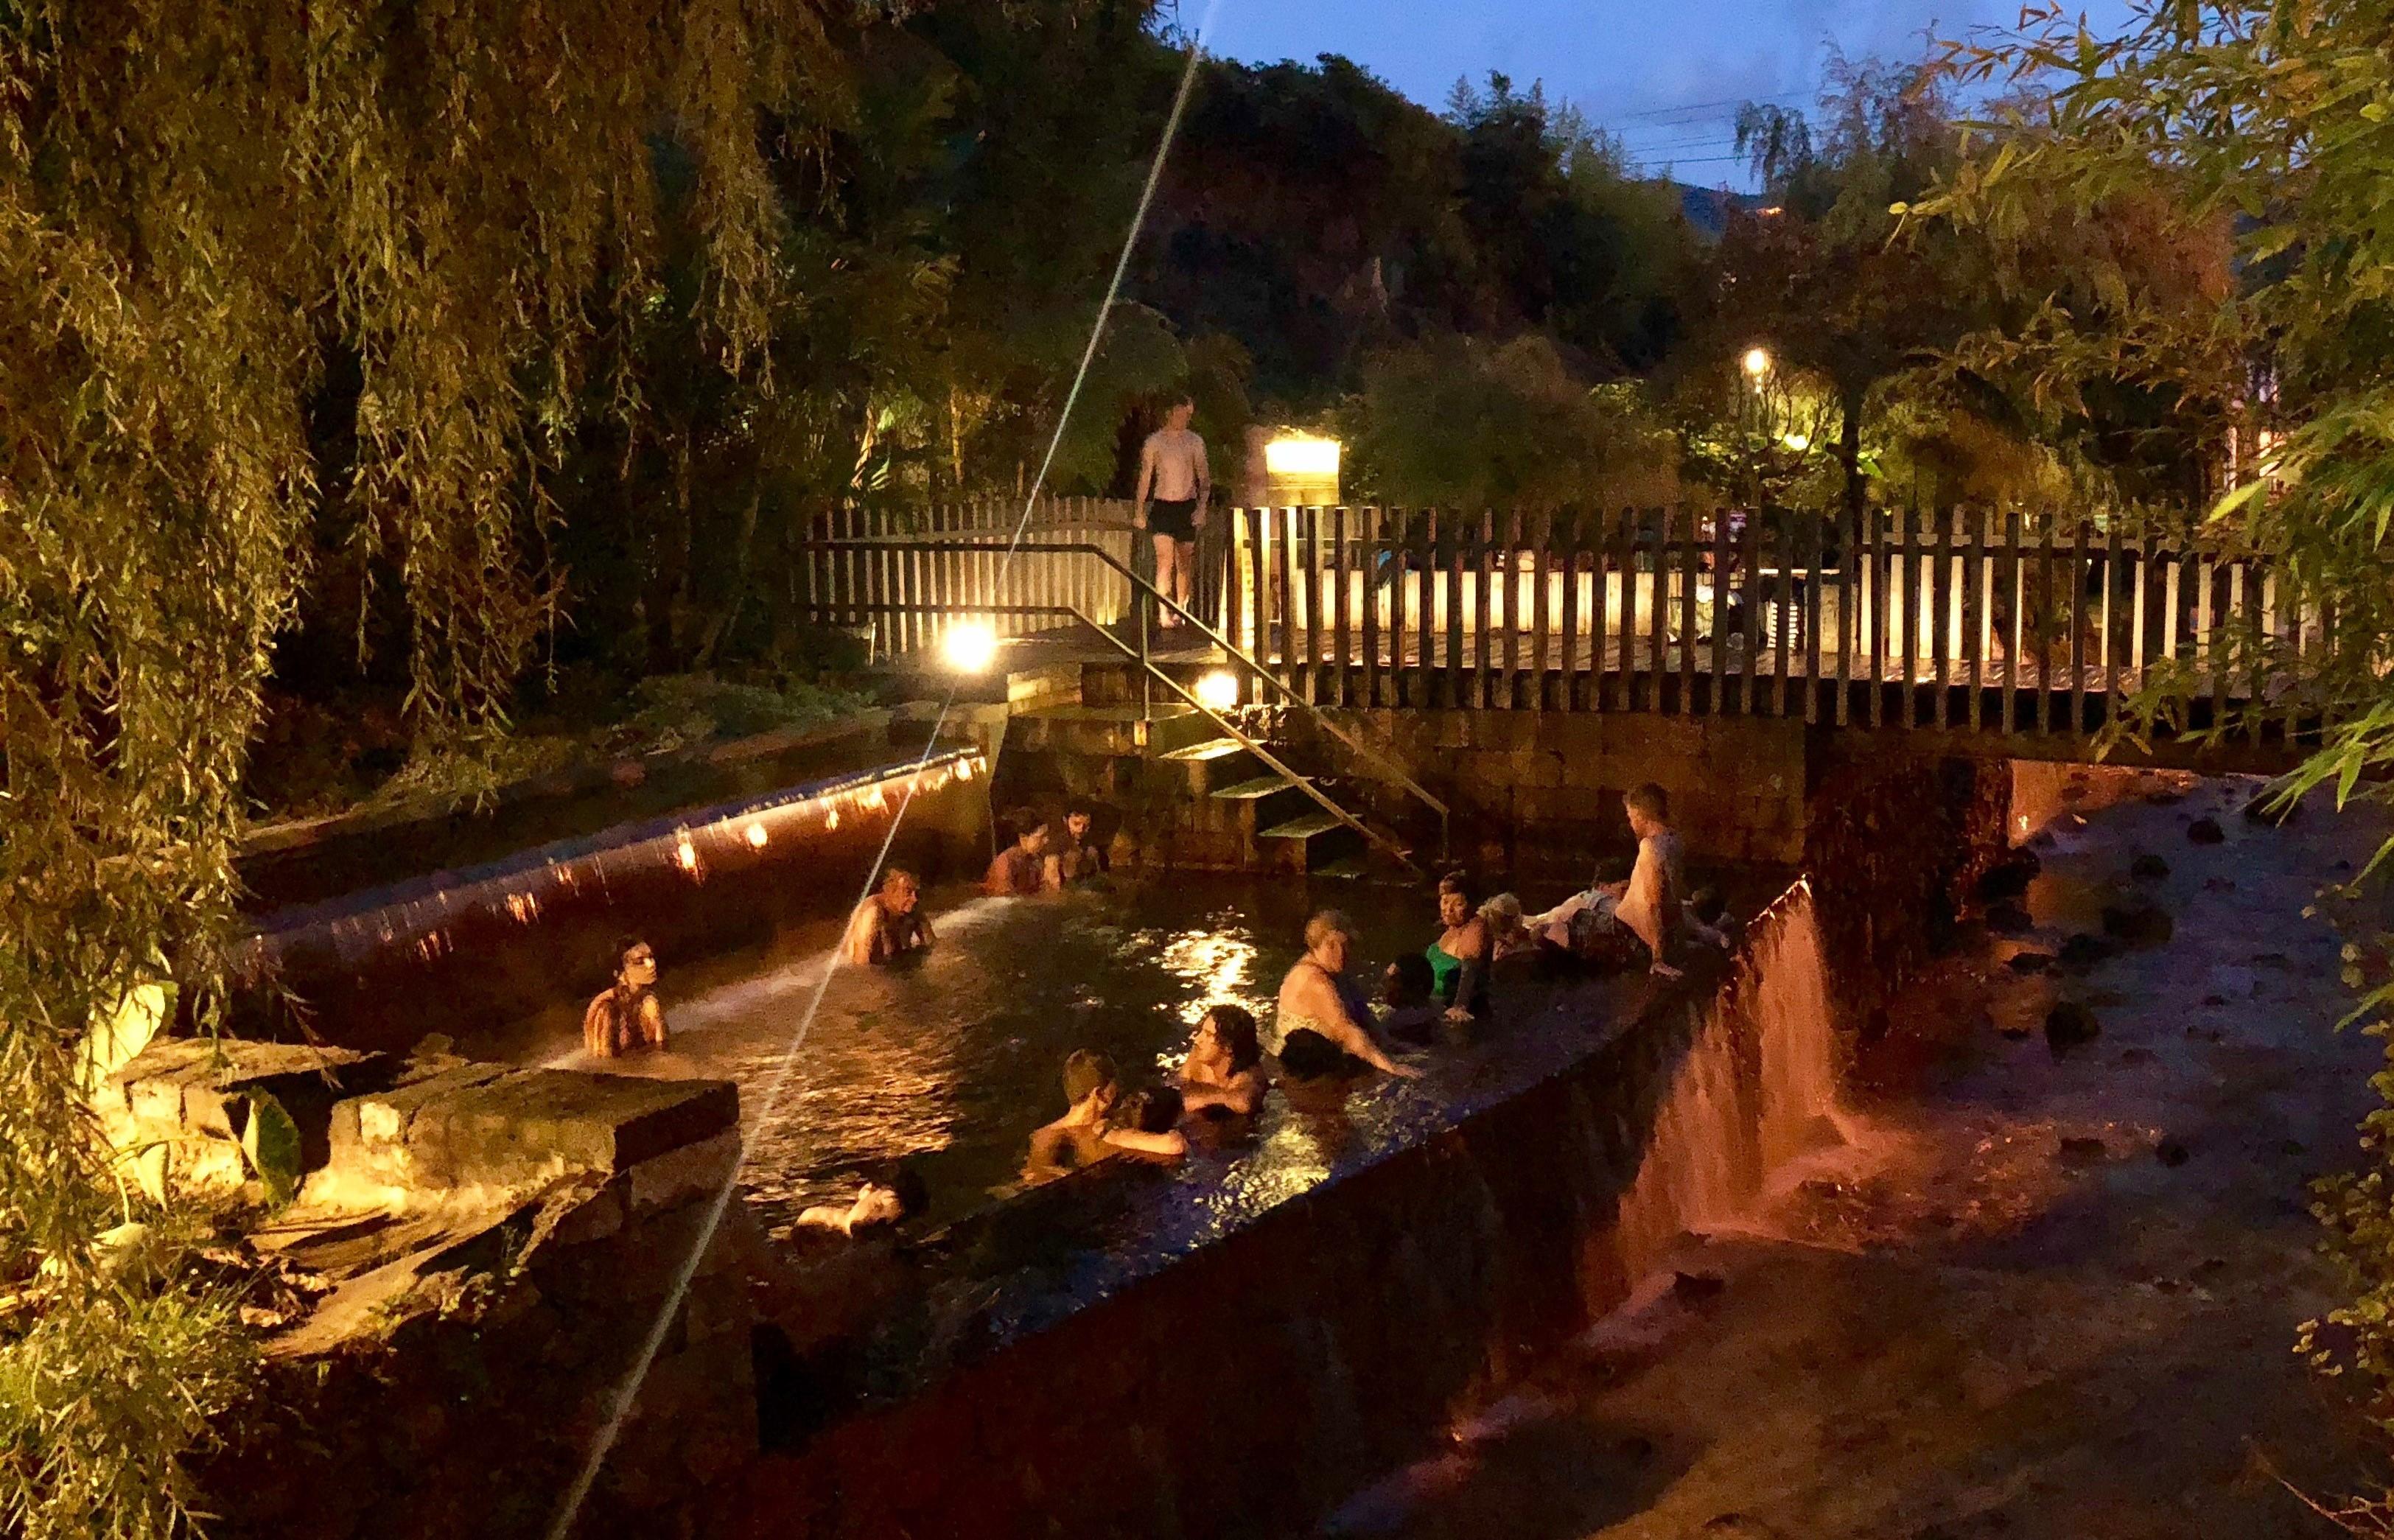 Poça da Dona Beija hot springs, Azores